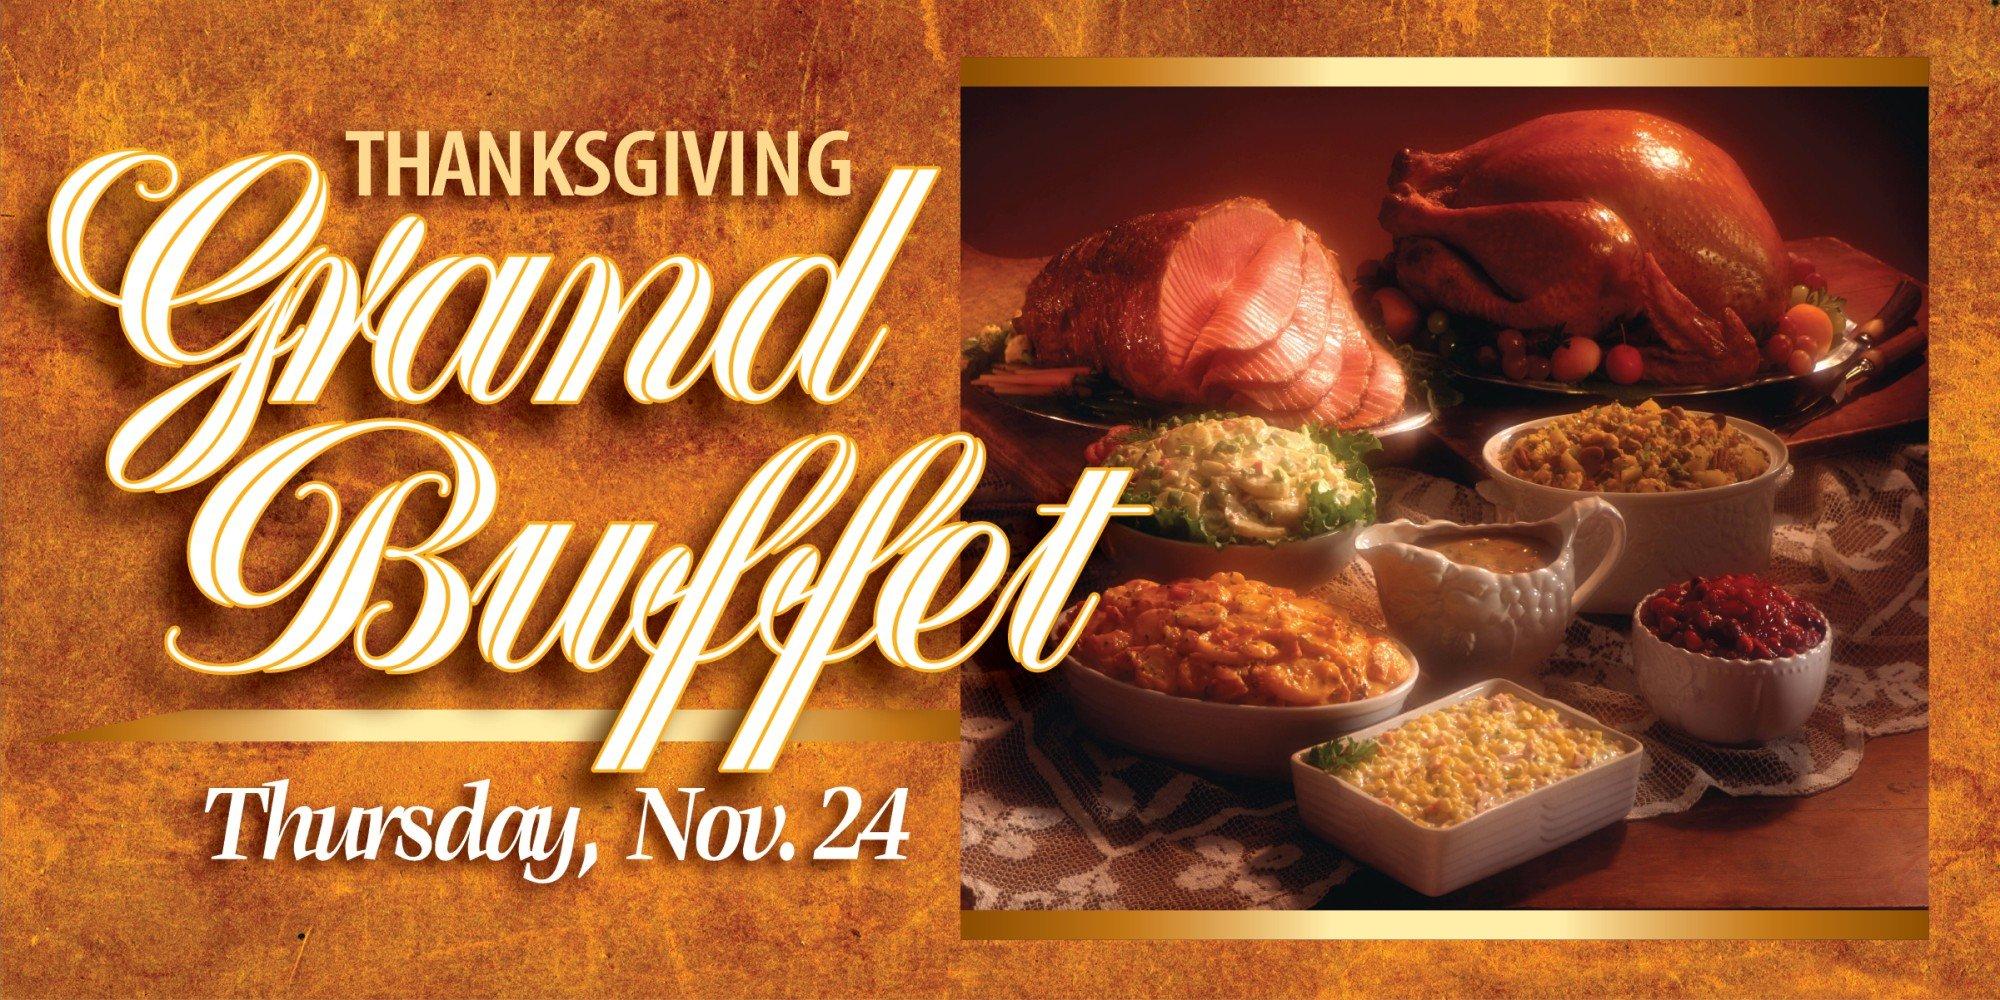 Web Header Promotion - Thanksgiving Grand Buffet